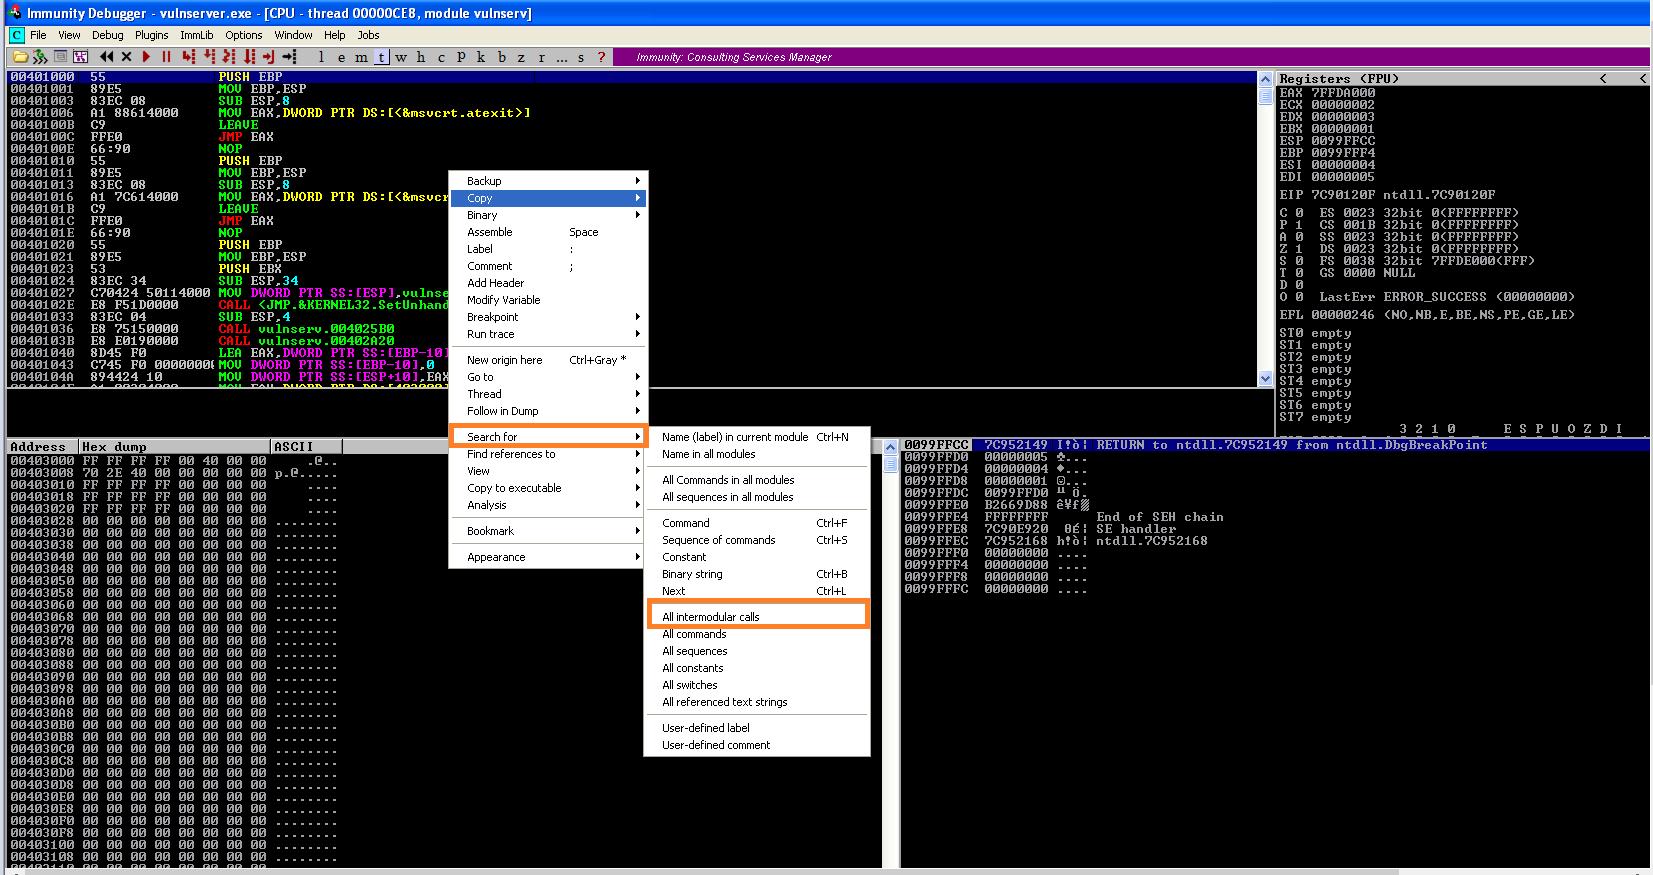 x86 custom shellcode Archives - BarrierSec